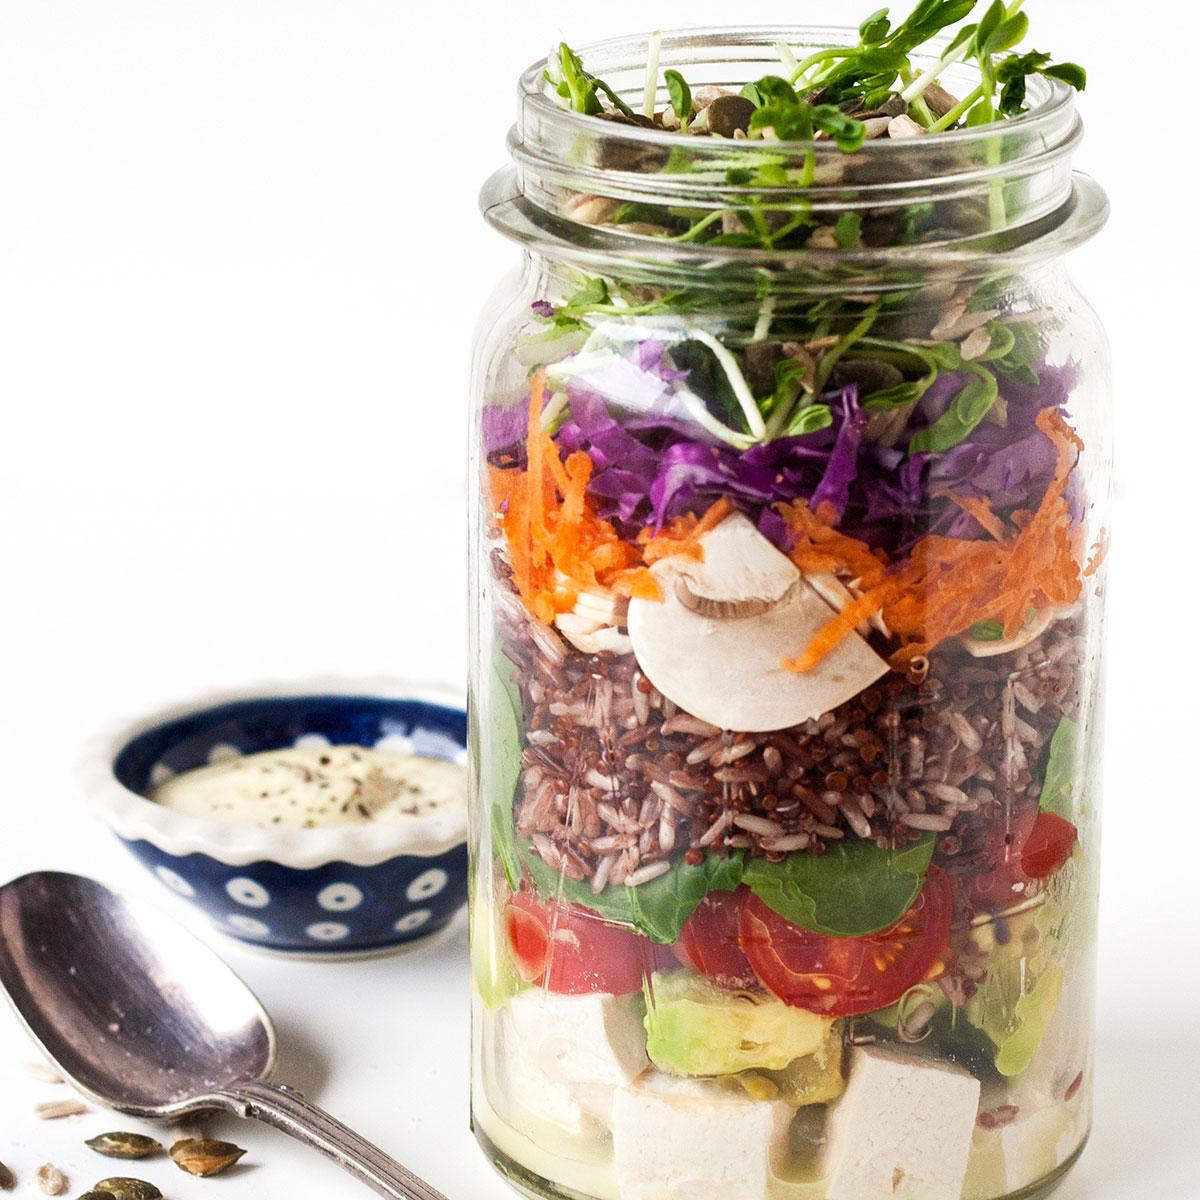 5 reasons to BEWARE of ready-made salads!